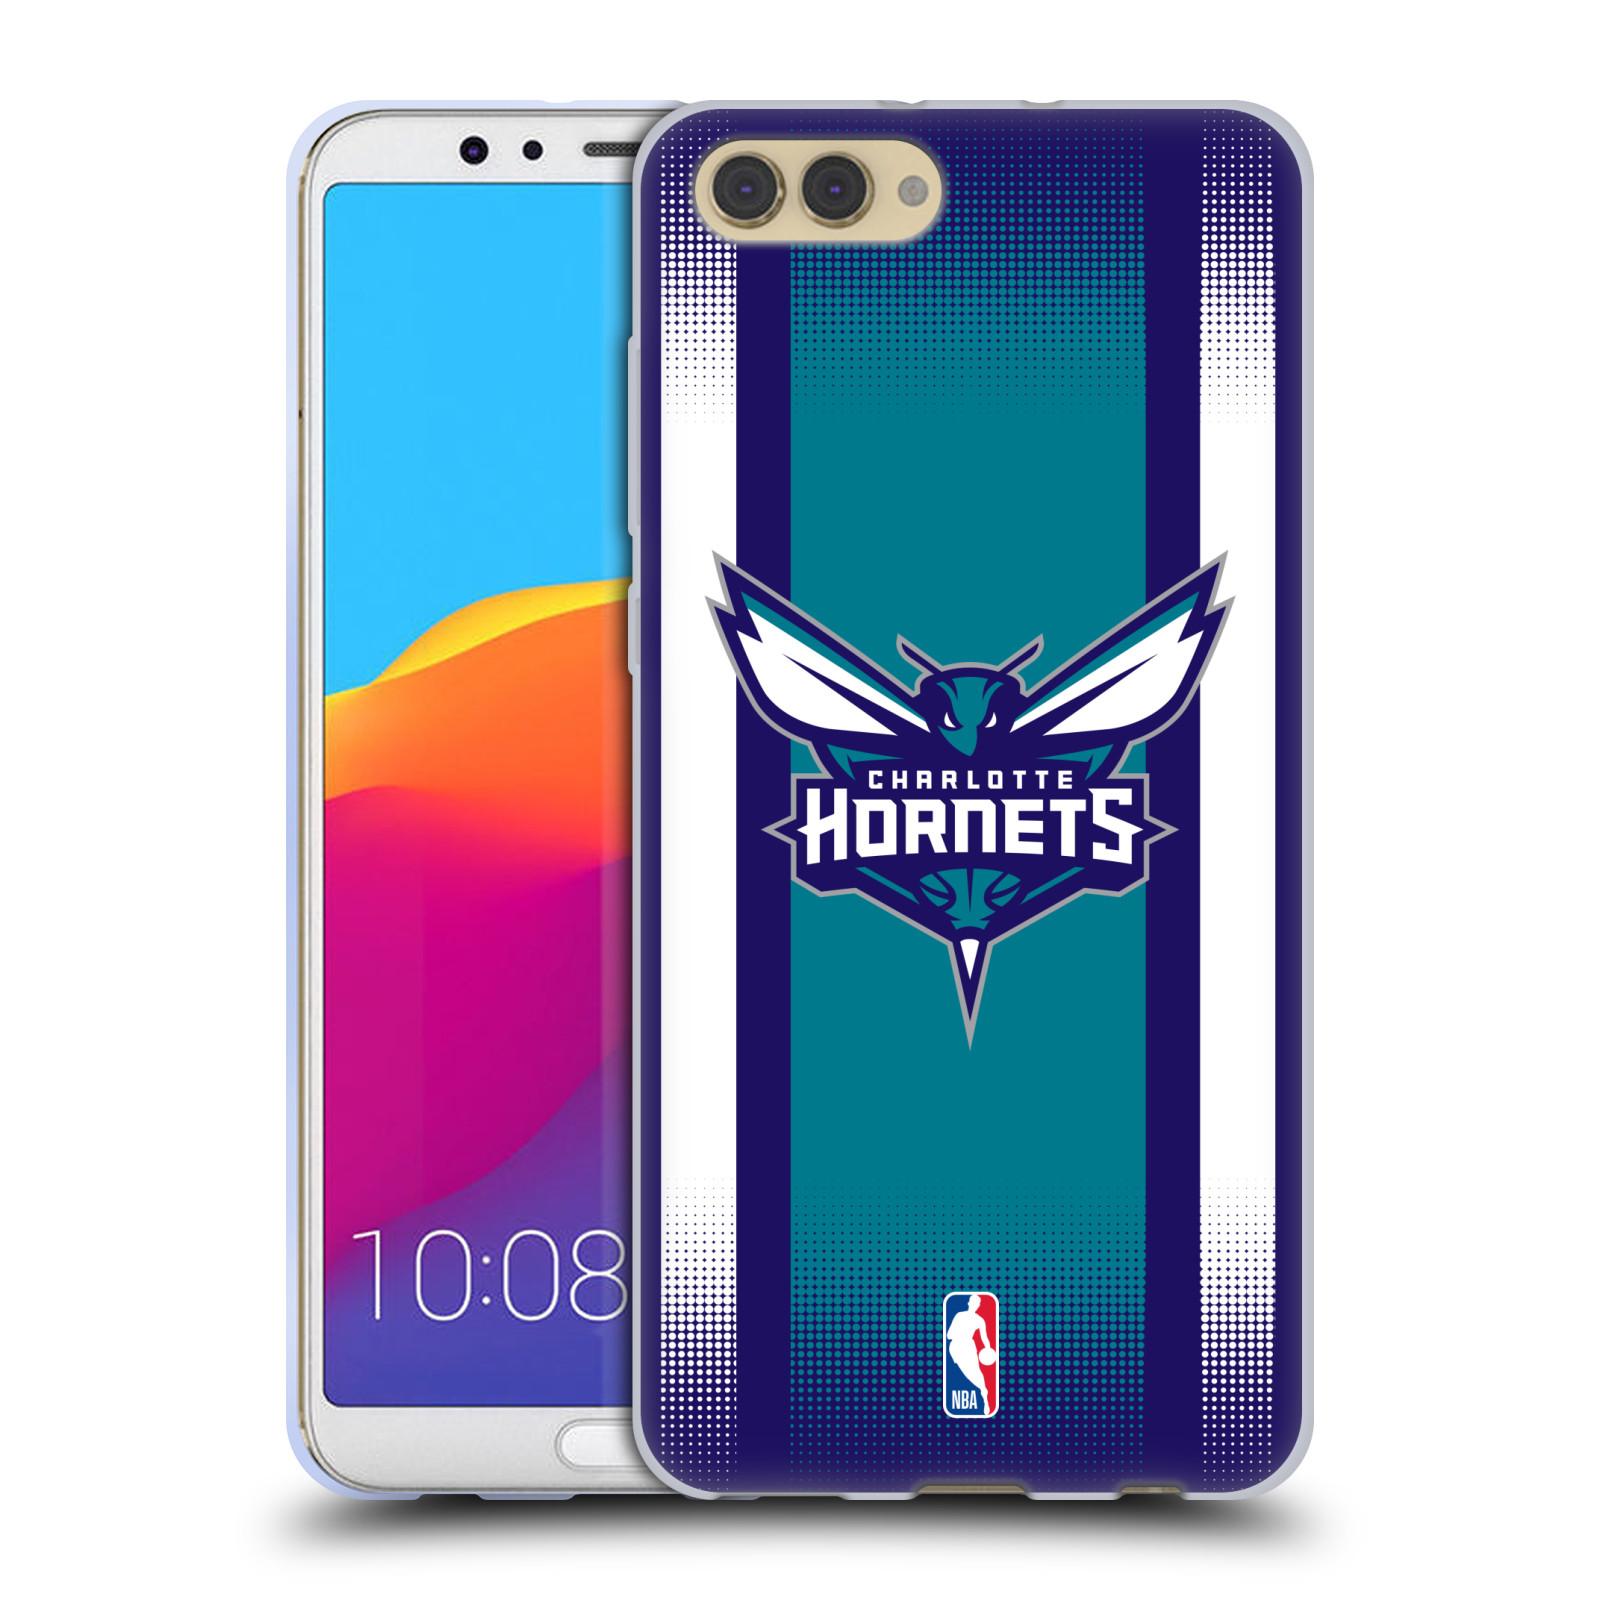 HEAD CASE silikonový obal na mobil Huawei HONOR VIEW 10 / V10 NBA Basketbalový klub Charlotte Hornets logo pruhy